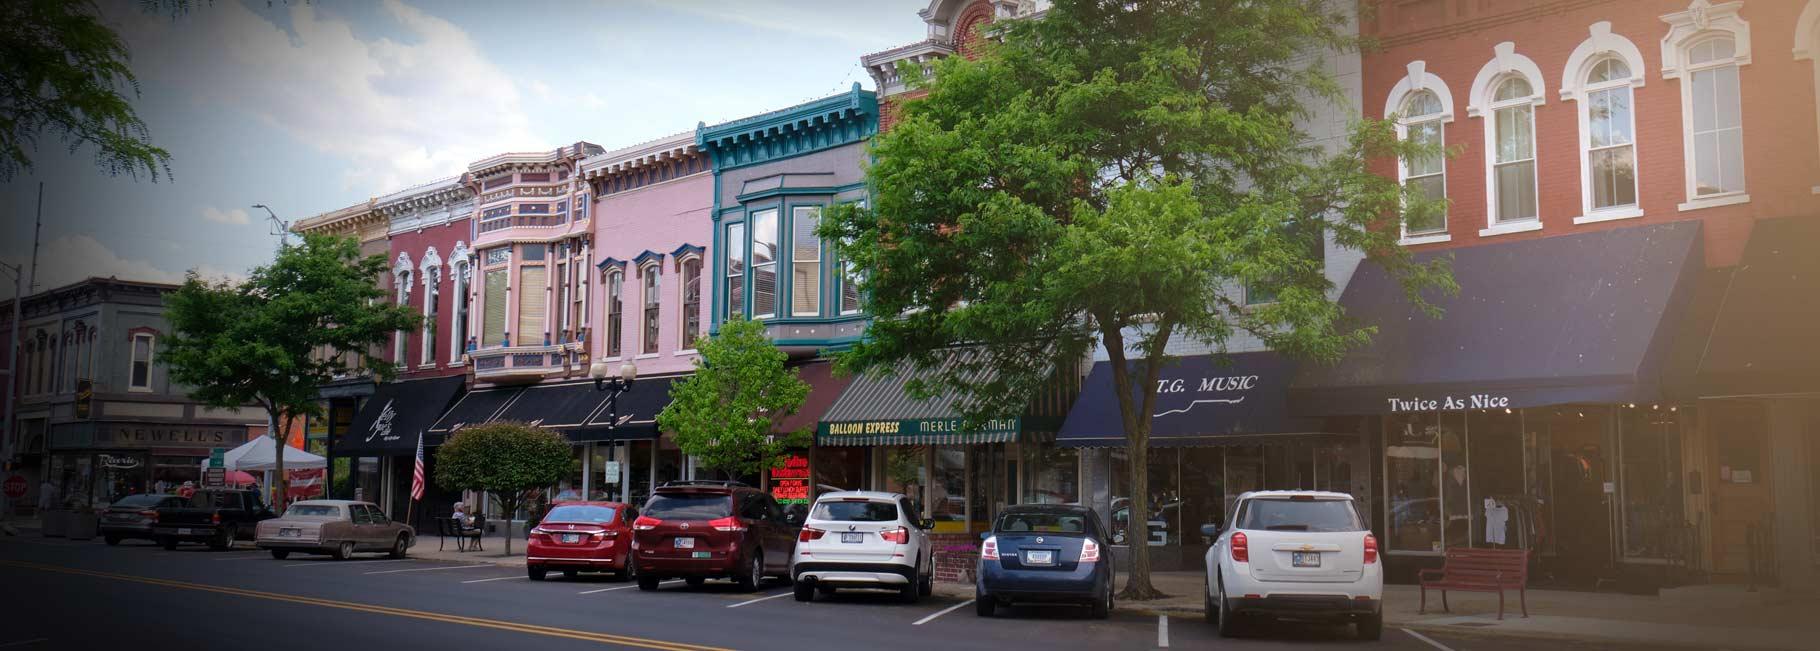 The Good of Goshen, Goshen, Indiana